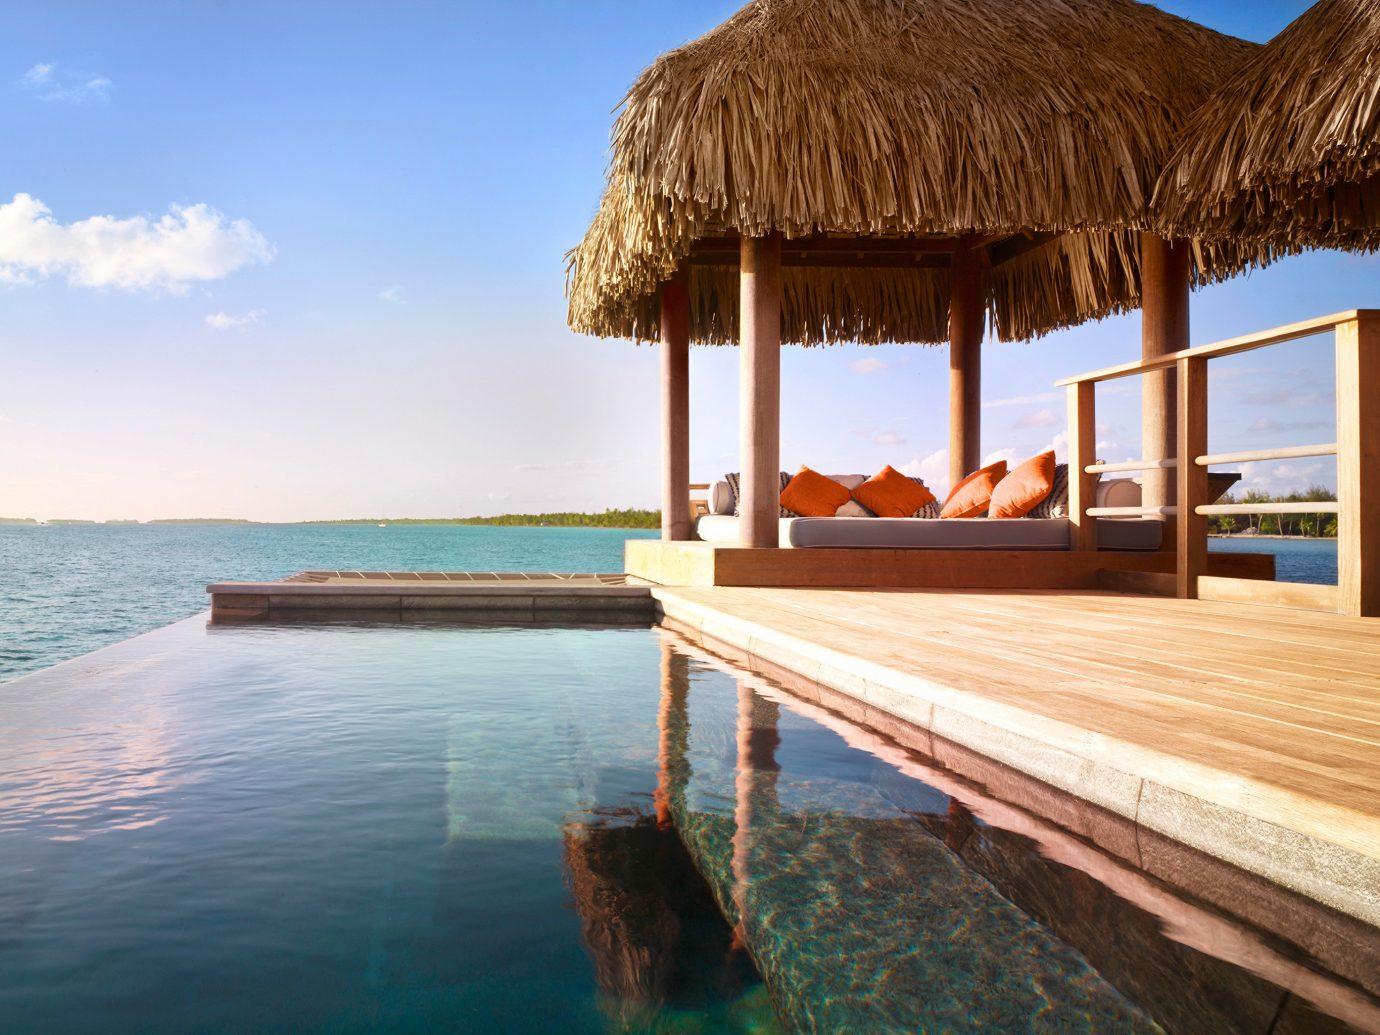 Hotels sky water outdoor leisure vacation Resort swimming pool Sea Ocean Beach estate Villa caribbean Lagoon bay shore